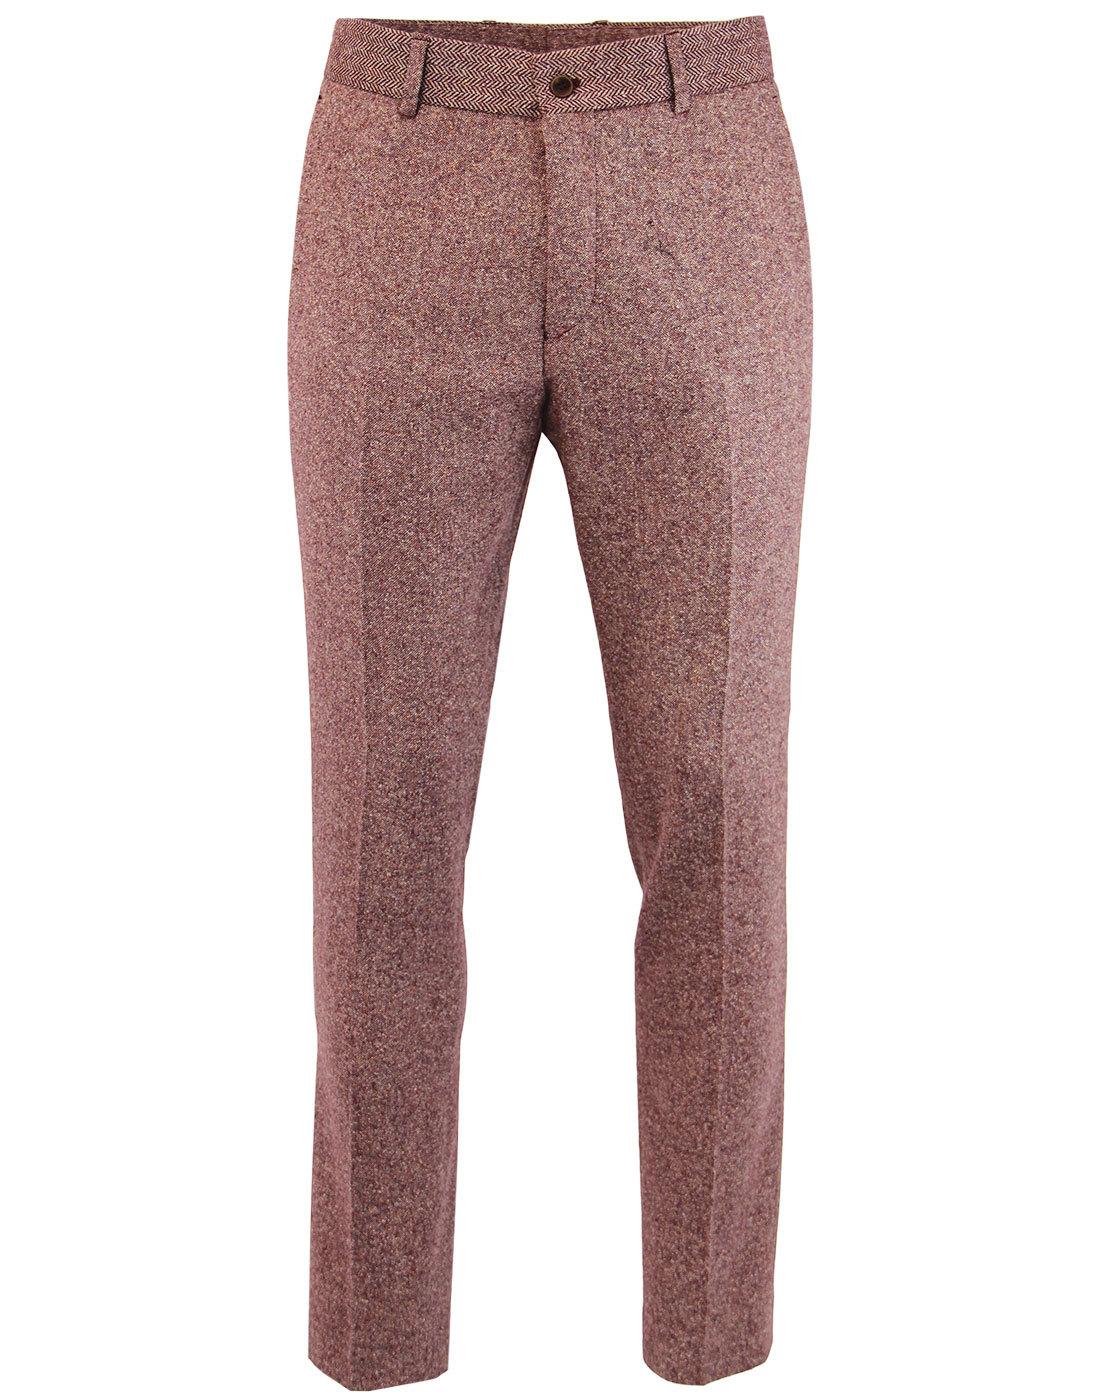 GIBSON LONDON 60s Mod Herringbone Donegal Trousers